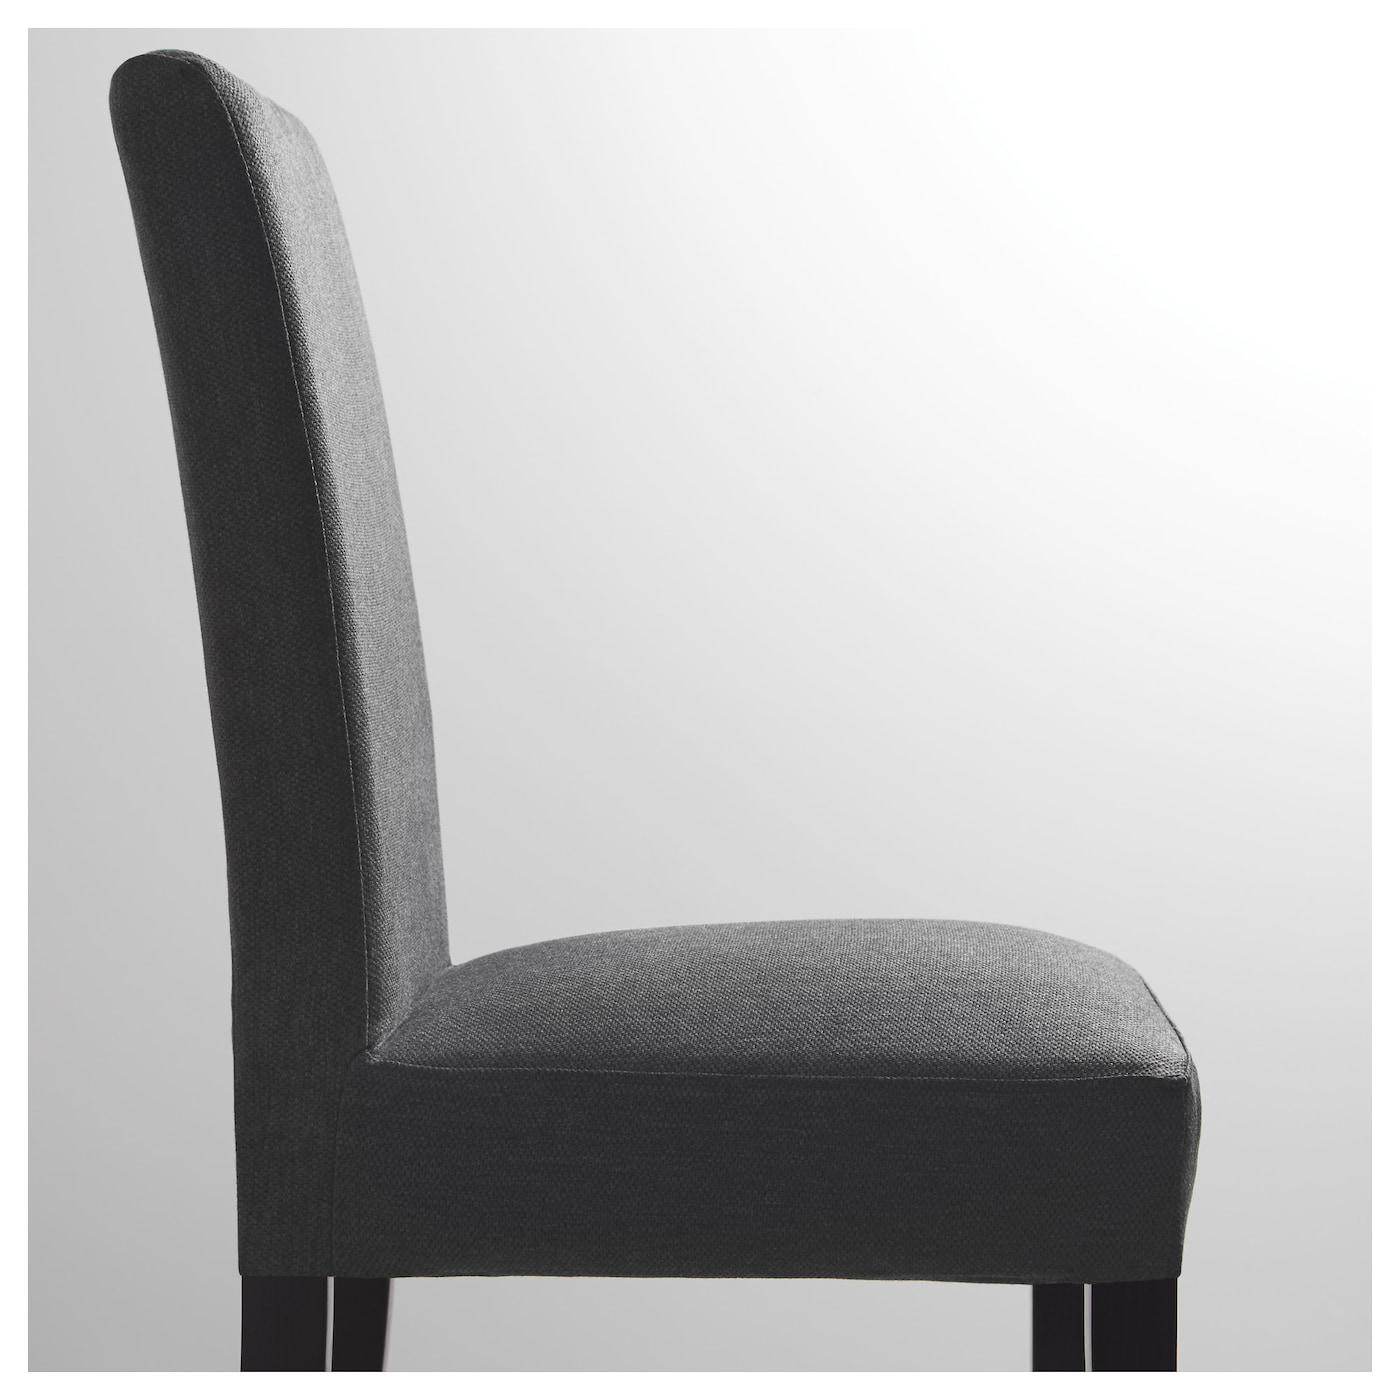 henriksdal chaise brun noir dansbo gris fonc ikea. Black Bedroom Furniture Sets. Home Design Ideas